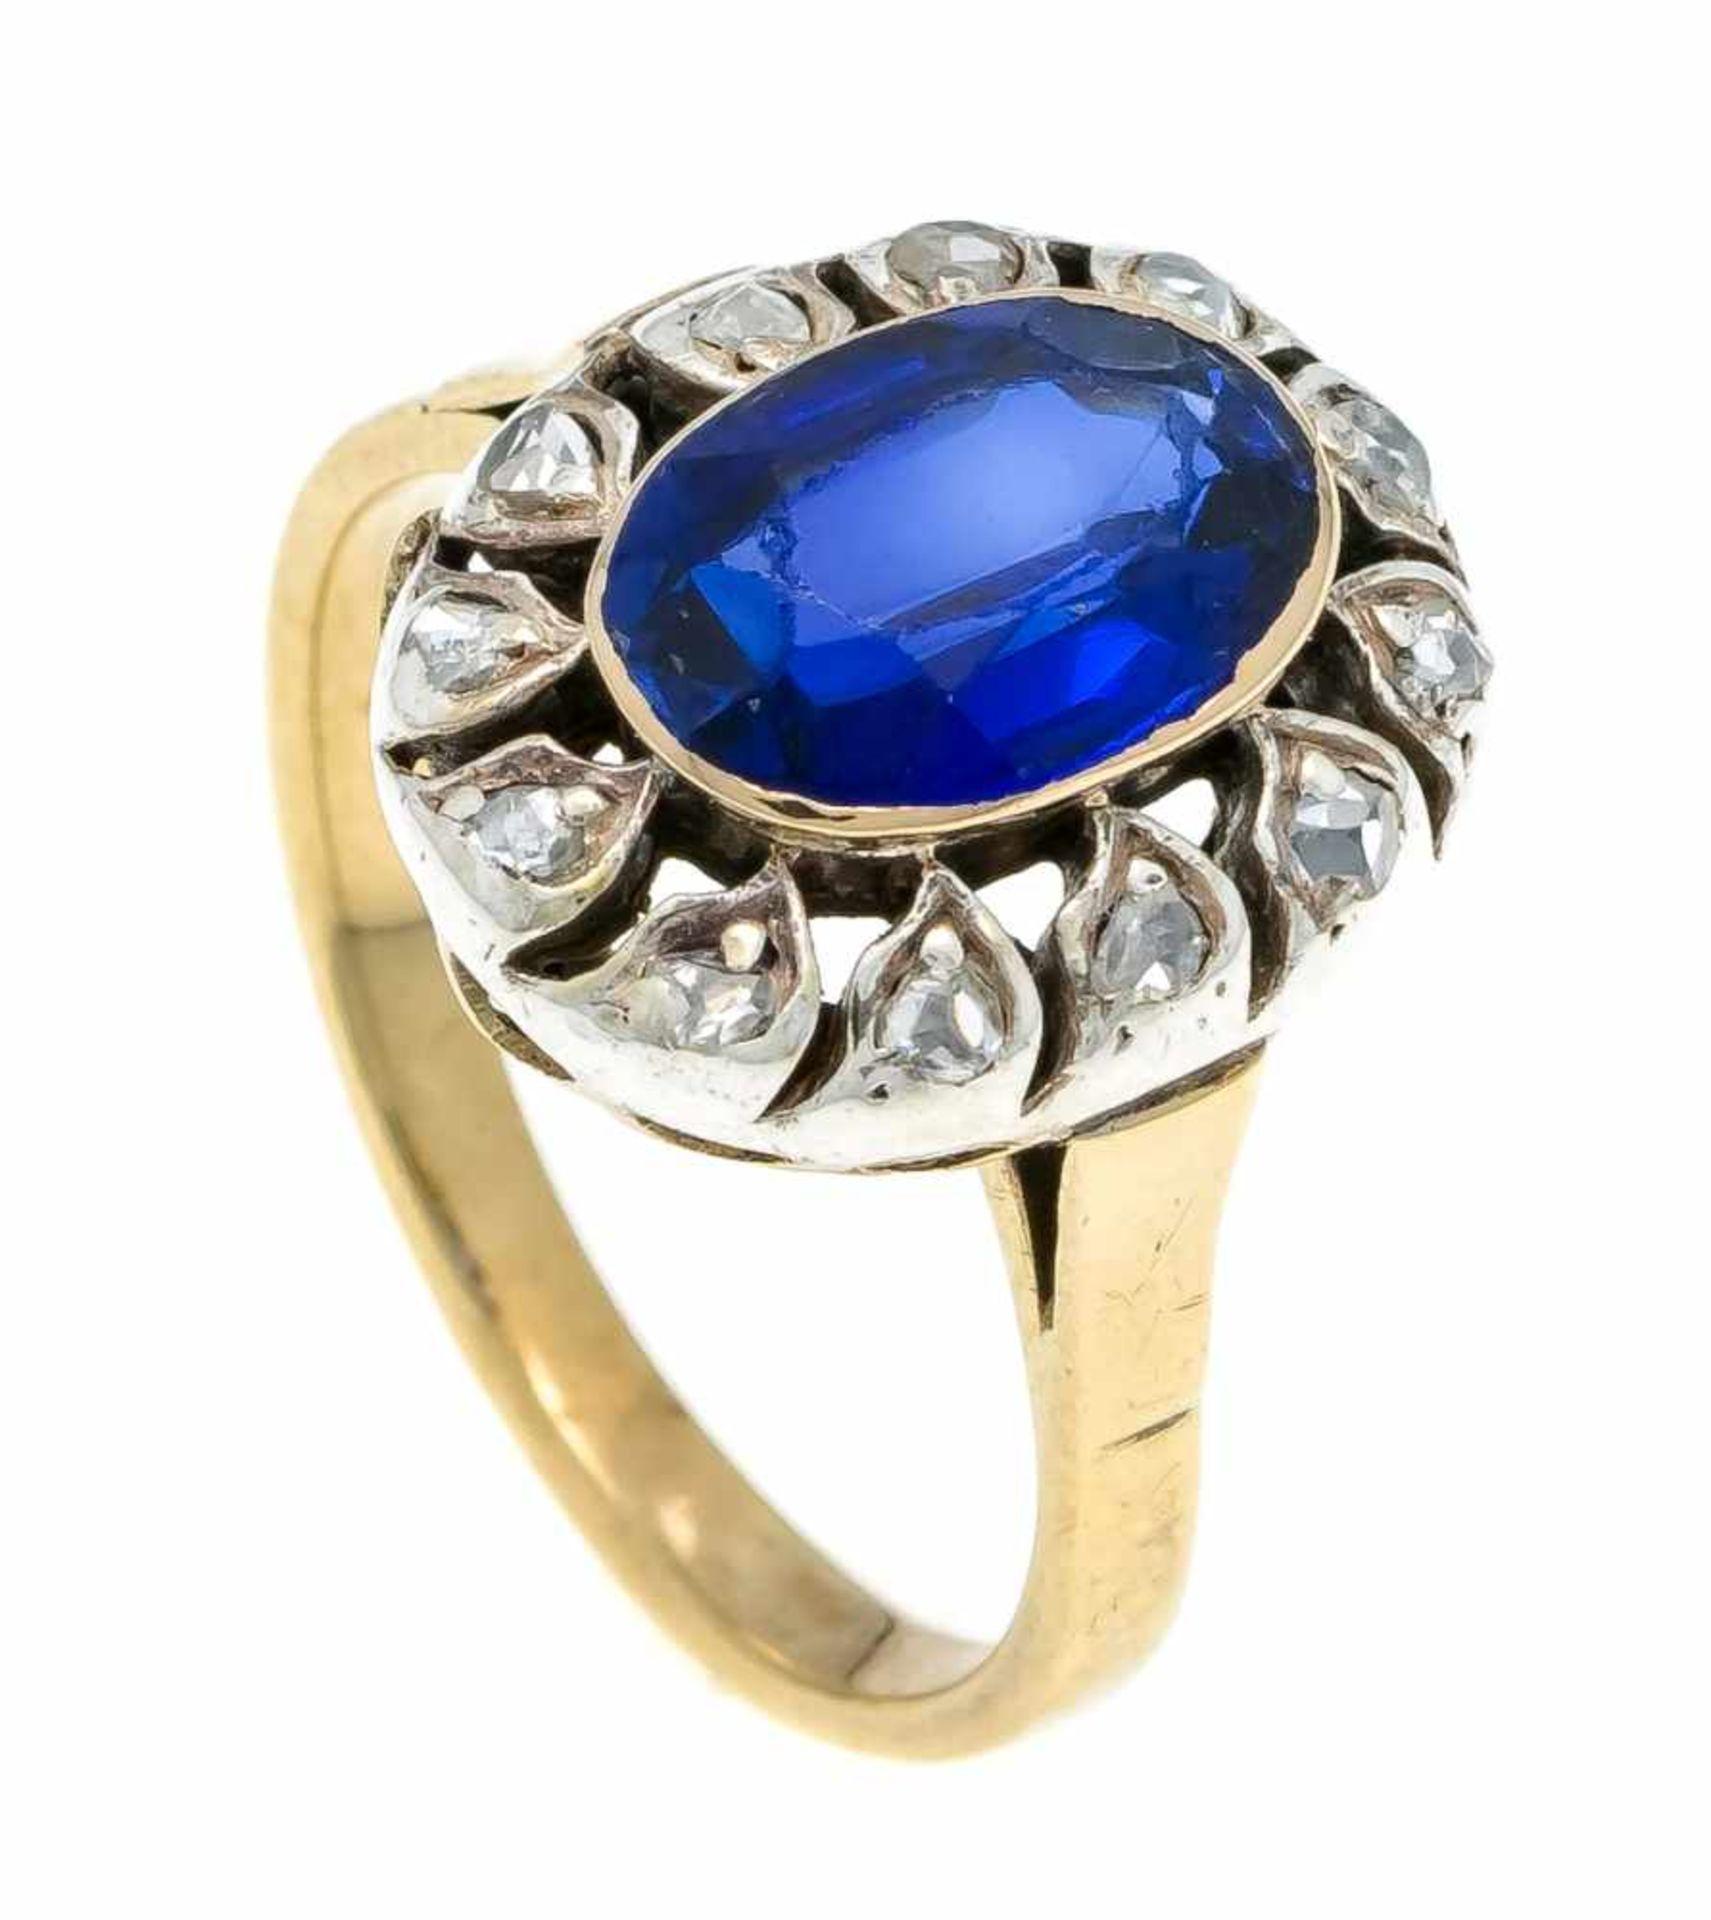 Saphir-Diamant-Ring RG/WG 585/000 Russland um 1920 mit einem oval fac. synth. Saphir 9,5 x 7 mm